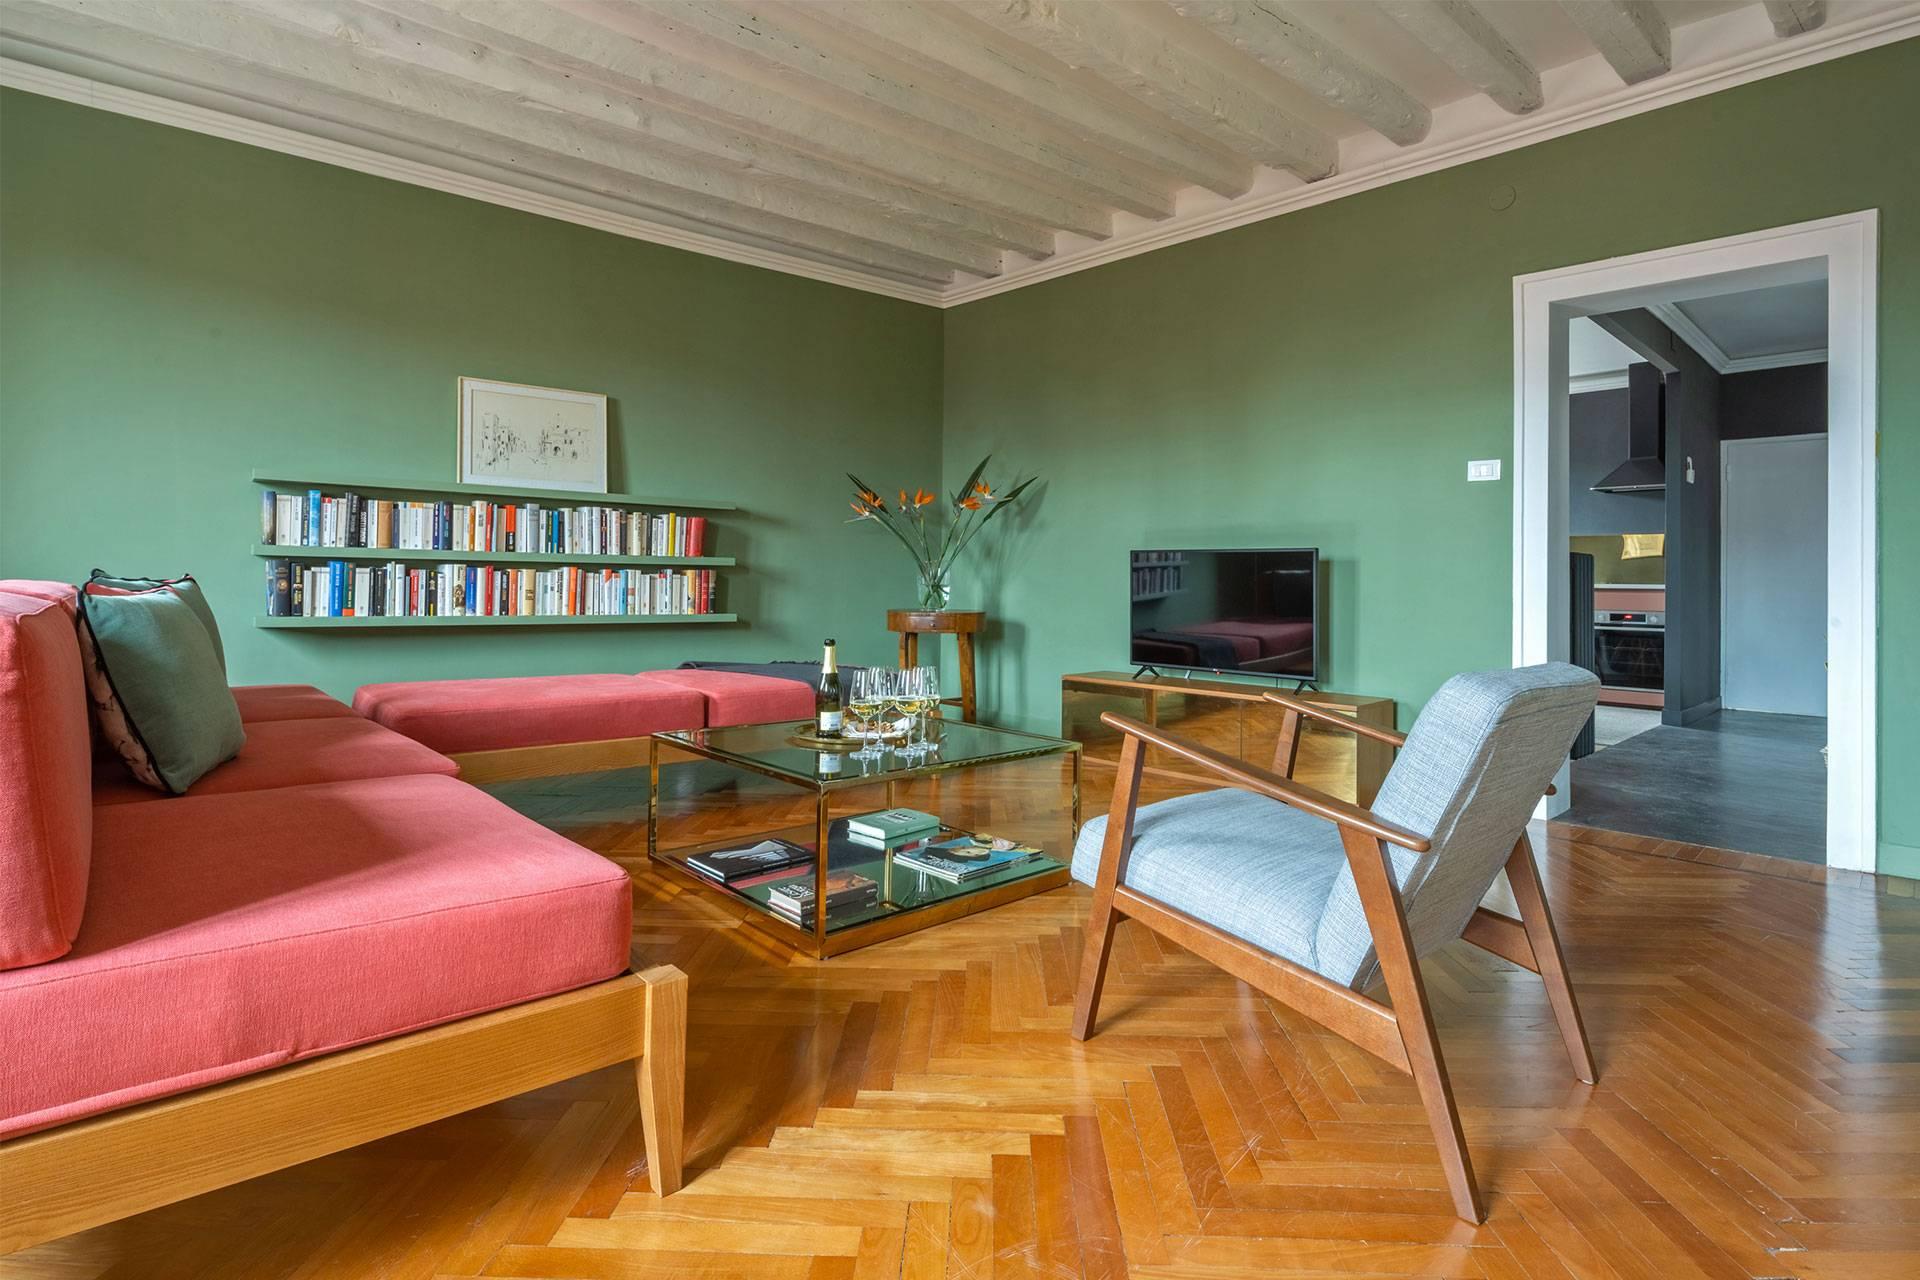 wooden beamed ceiling, fishbone parquet flooring, mid century design furniture